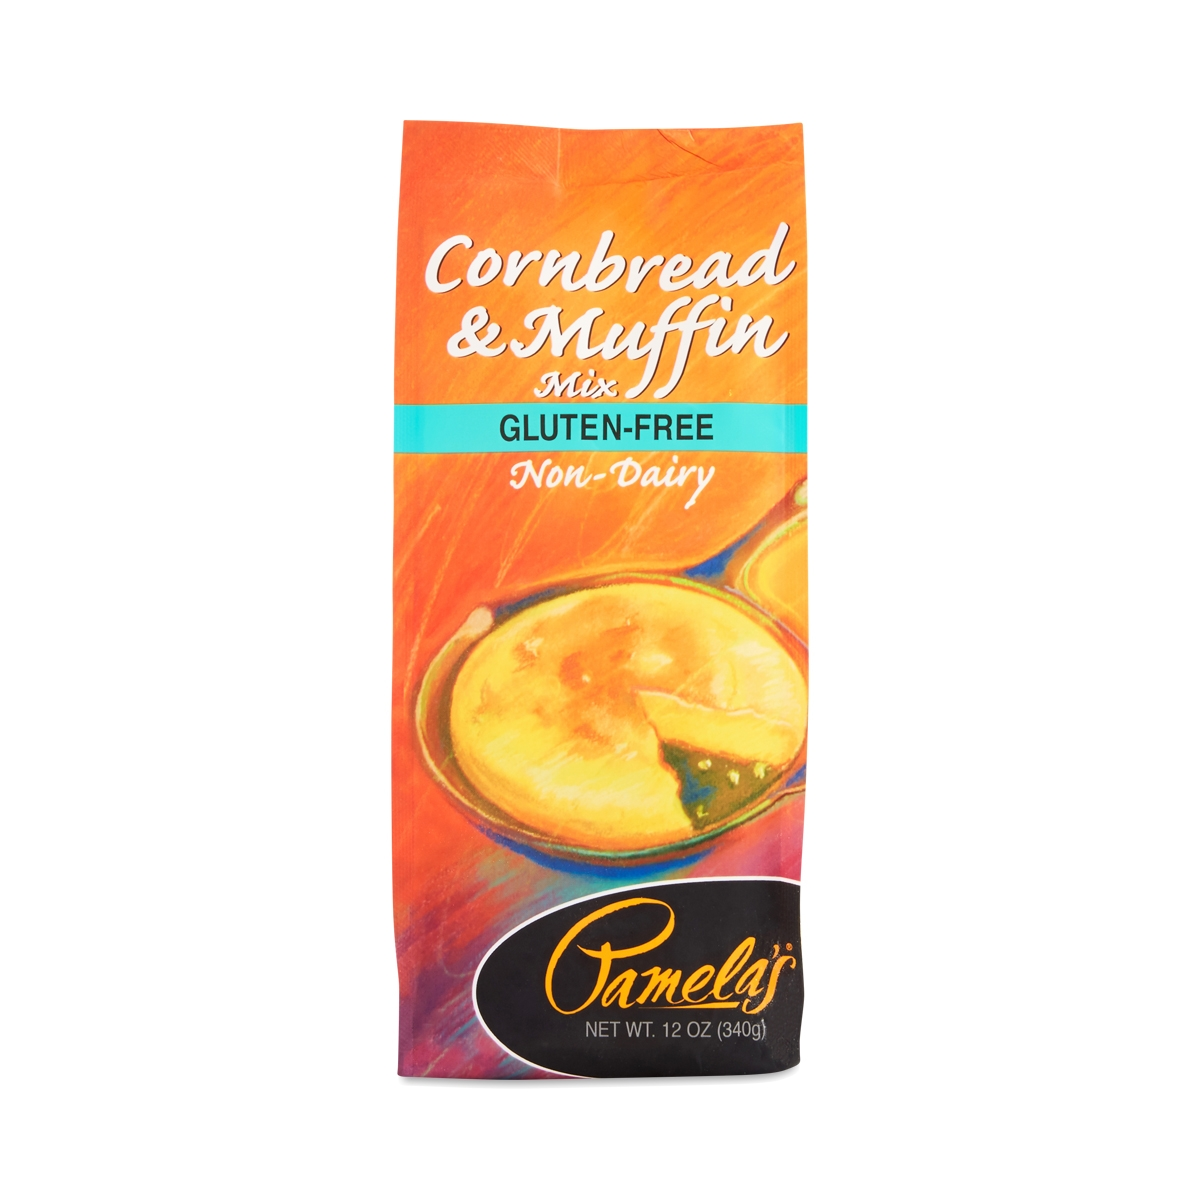 Gluten-Free Cornbread & Muffin Mix by Pamela's - Thrive Market